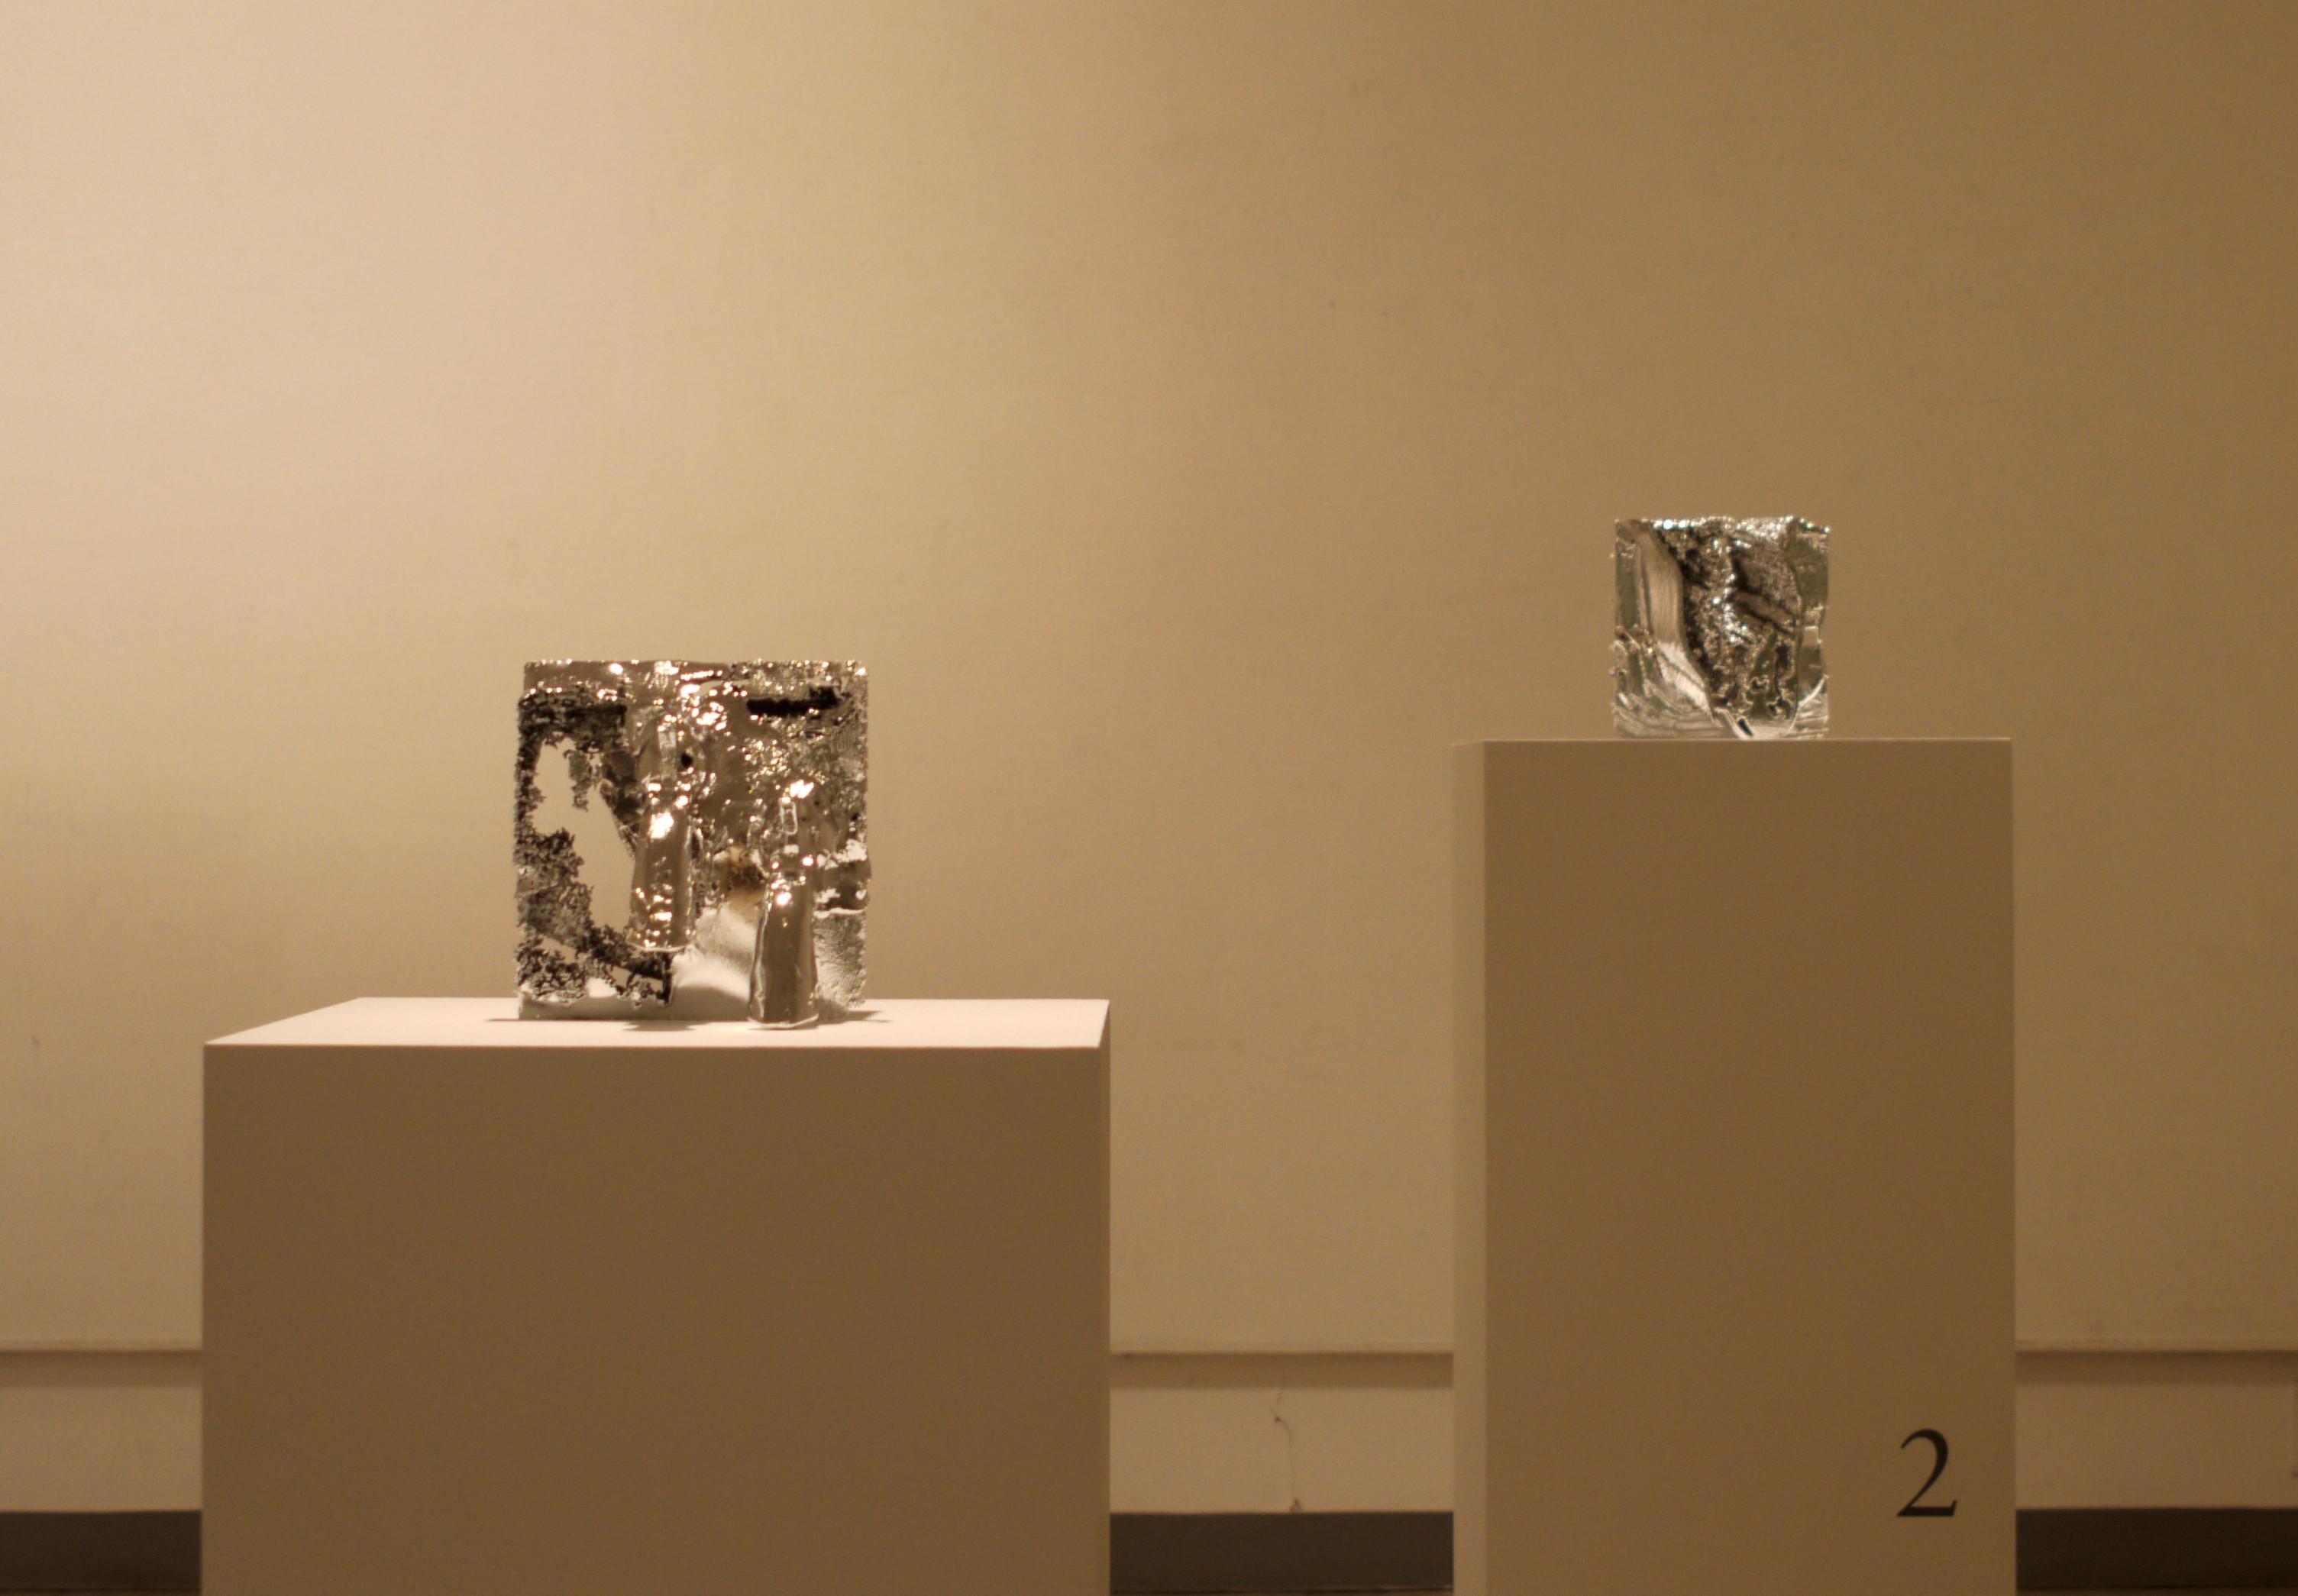 《Film Without Film – Piano / Donky, Pistol / Man》2012年、 樹脂、 塗料 22.0×22.0×26.0 cm 展示風景:ニューアート展 NEXT 2012 動く絵、 描かれる時間:Phantasmagoria、 横浜市民ギャラリー(C)SHIMURAbros